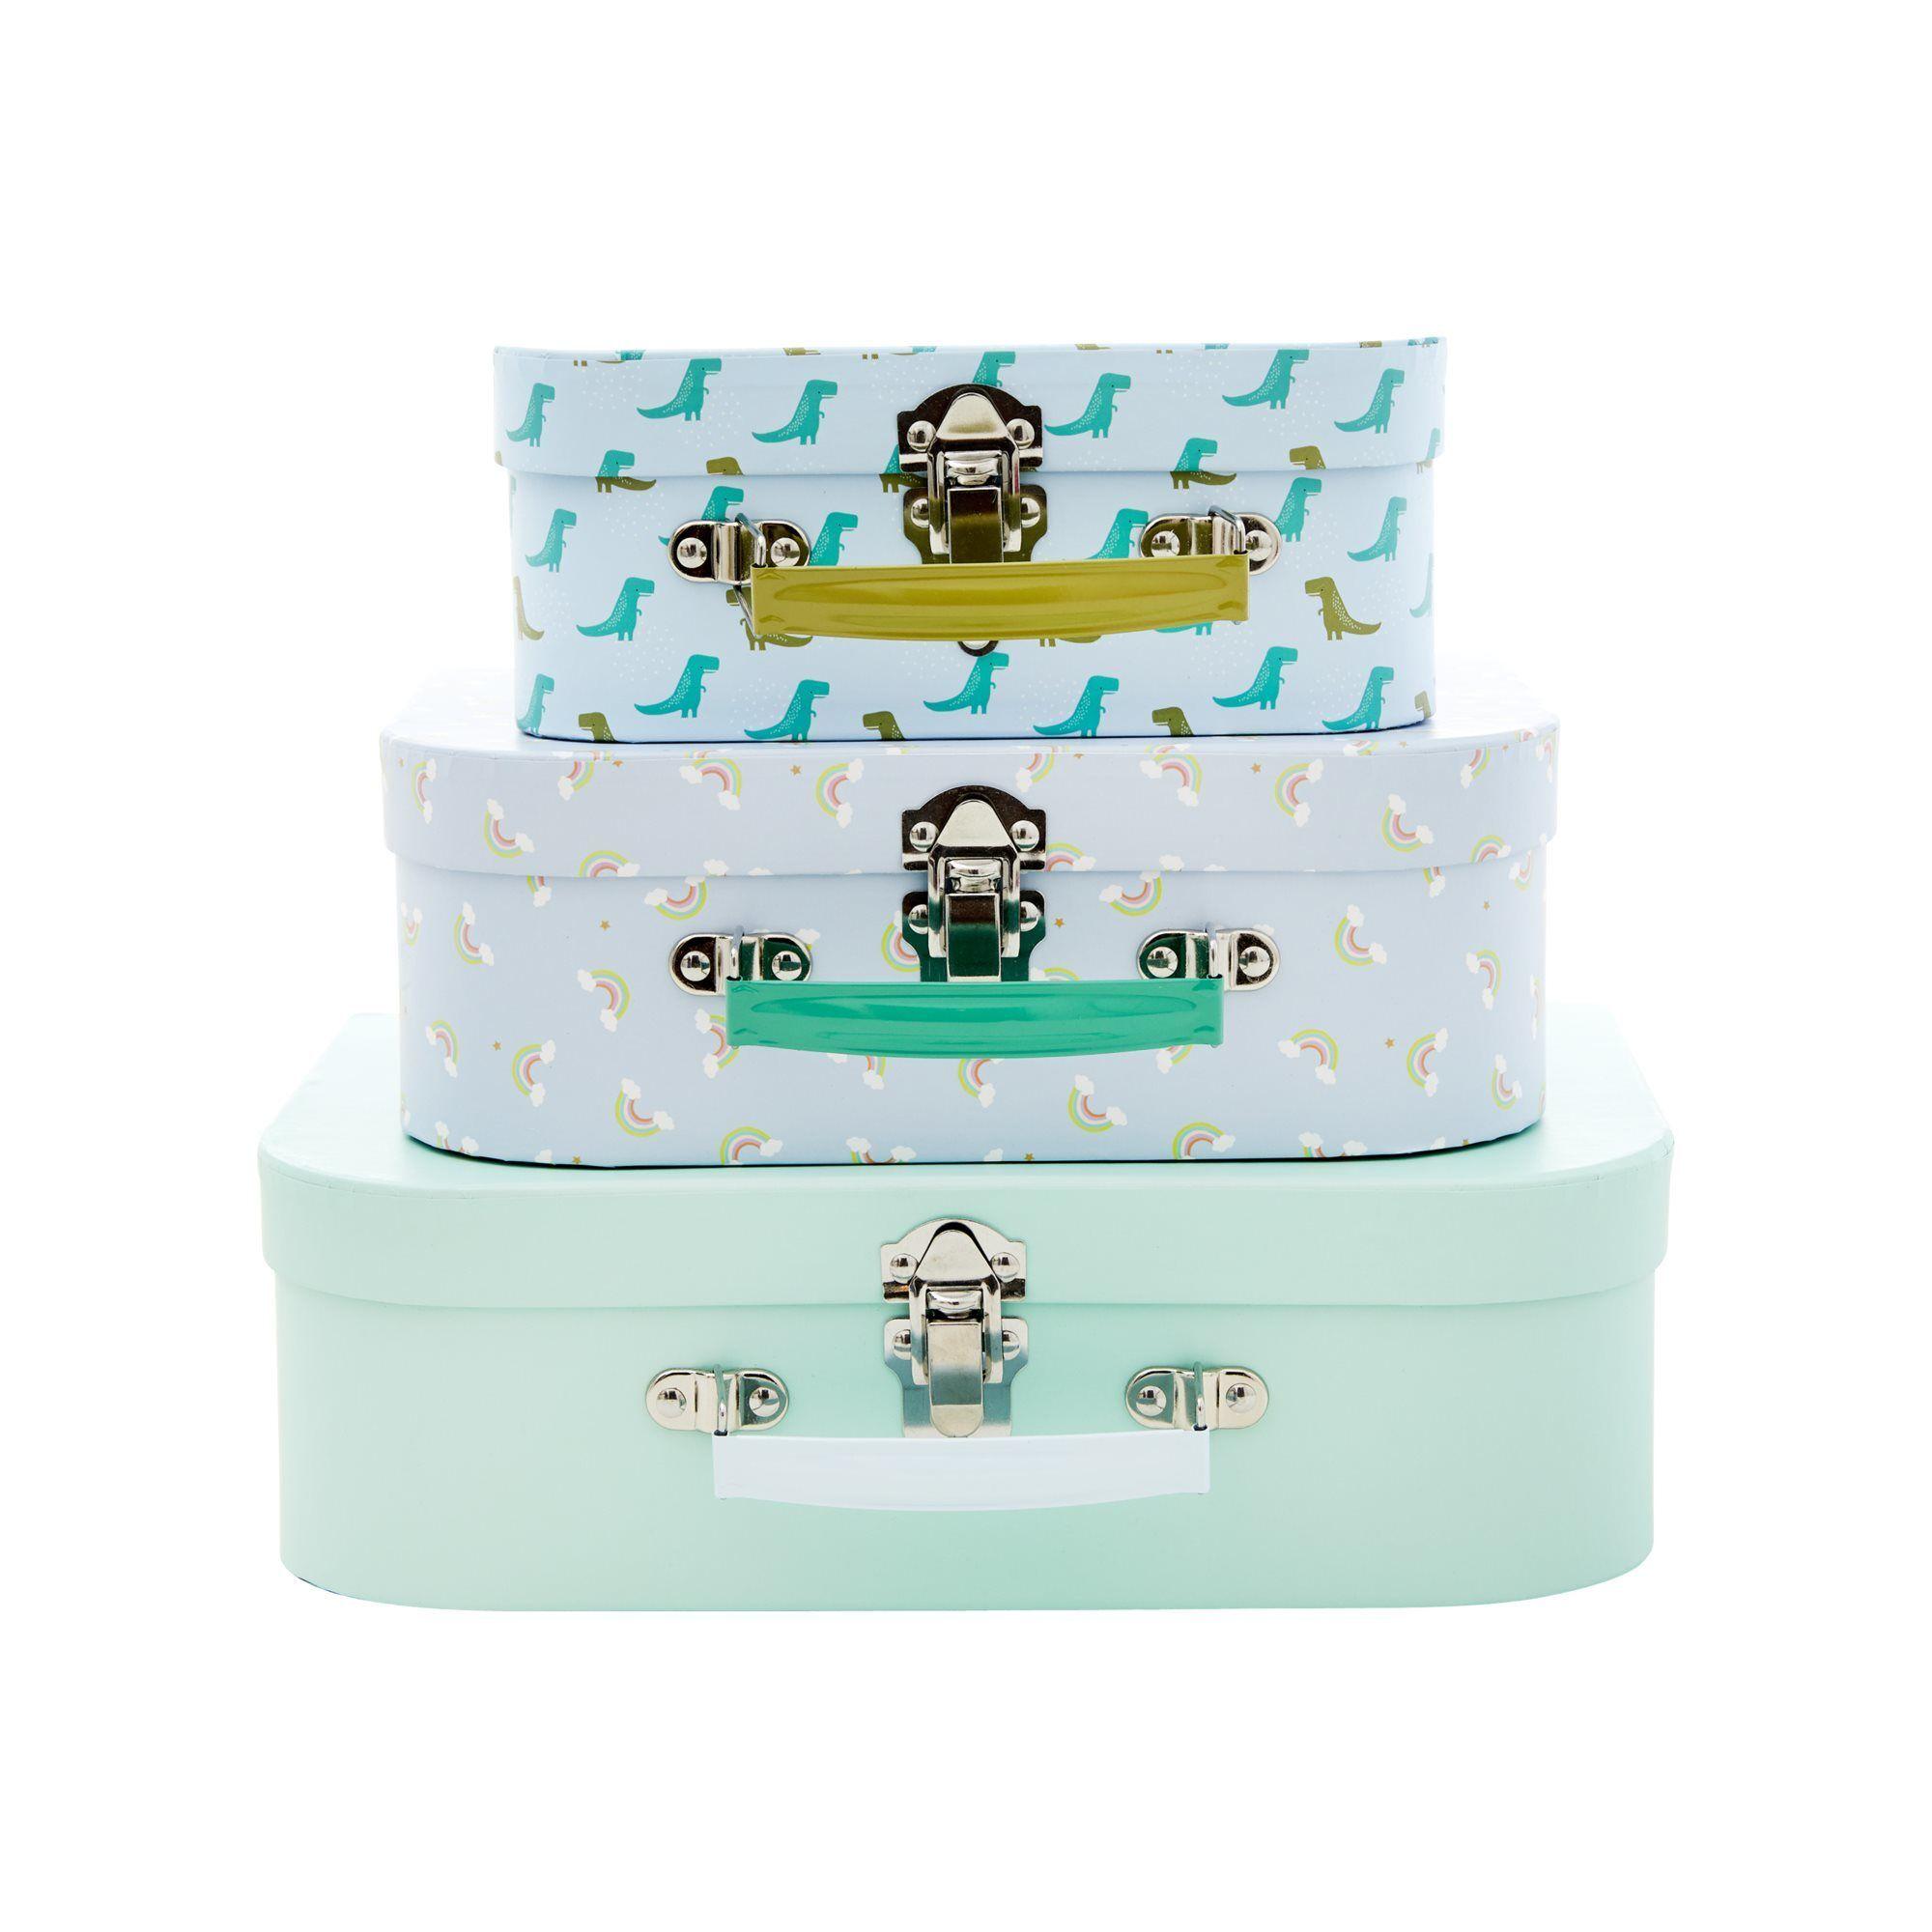 Rice Koffert 3-pack, Grønn & Blå